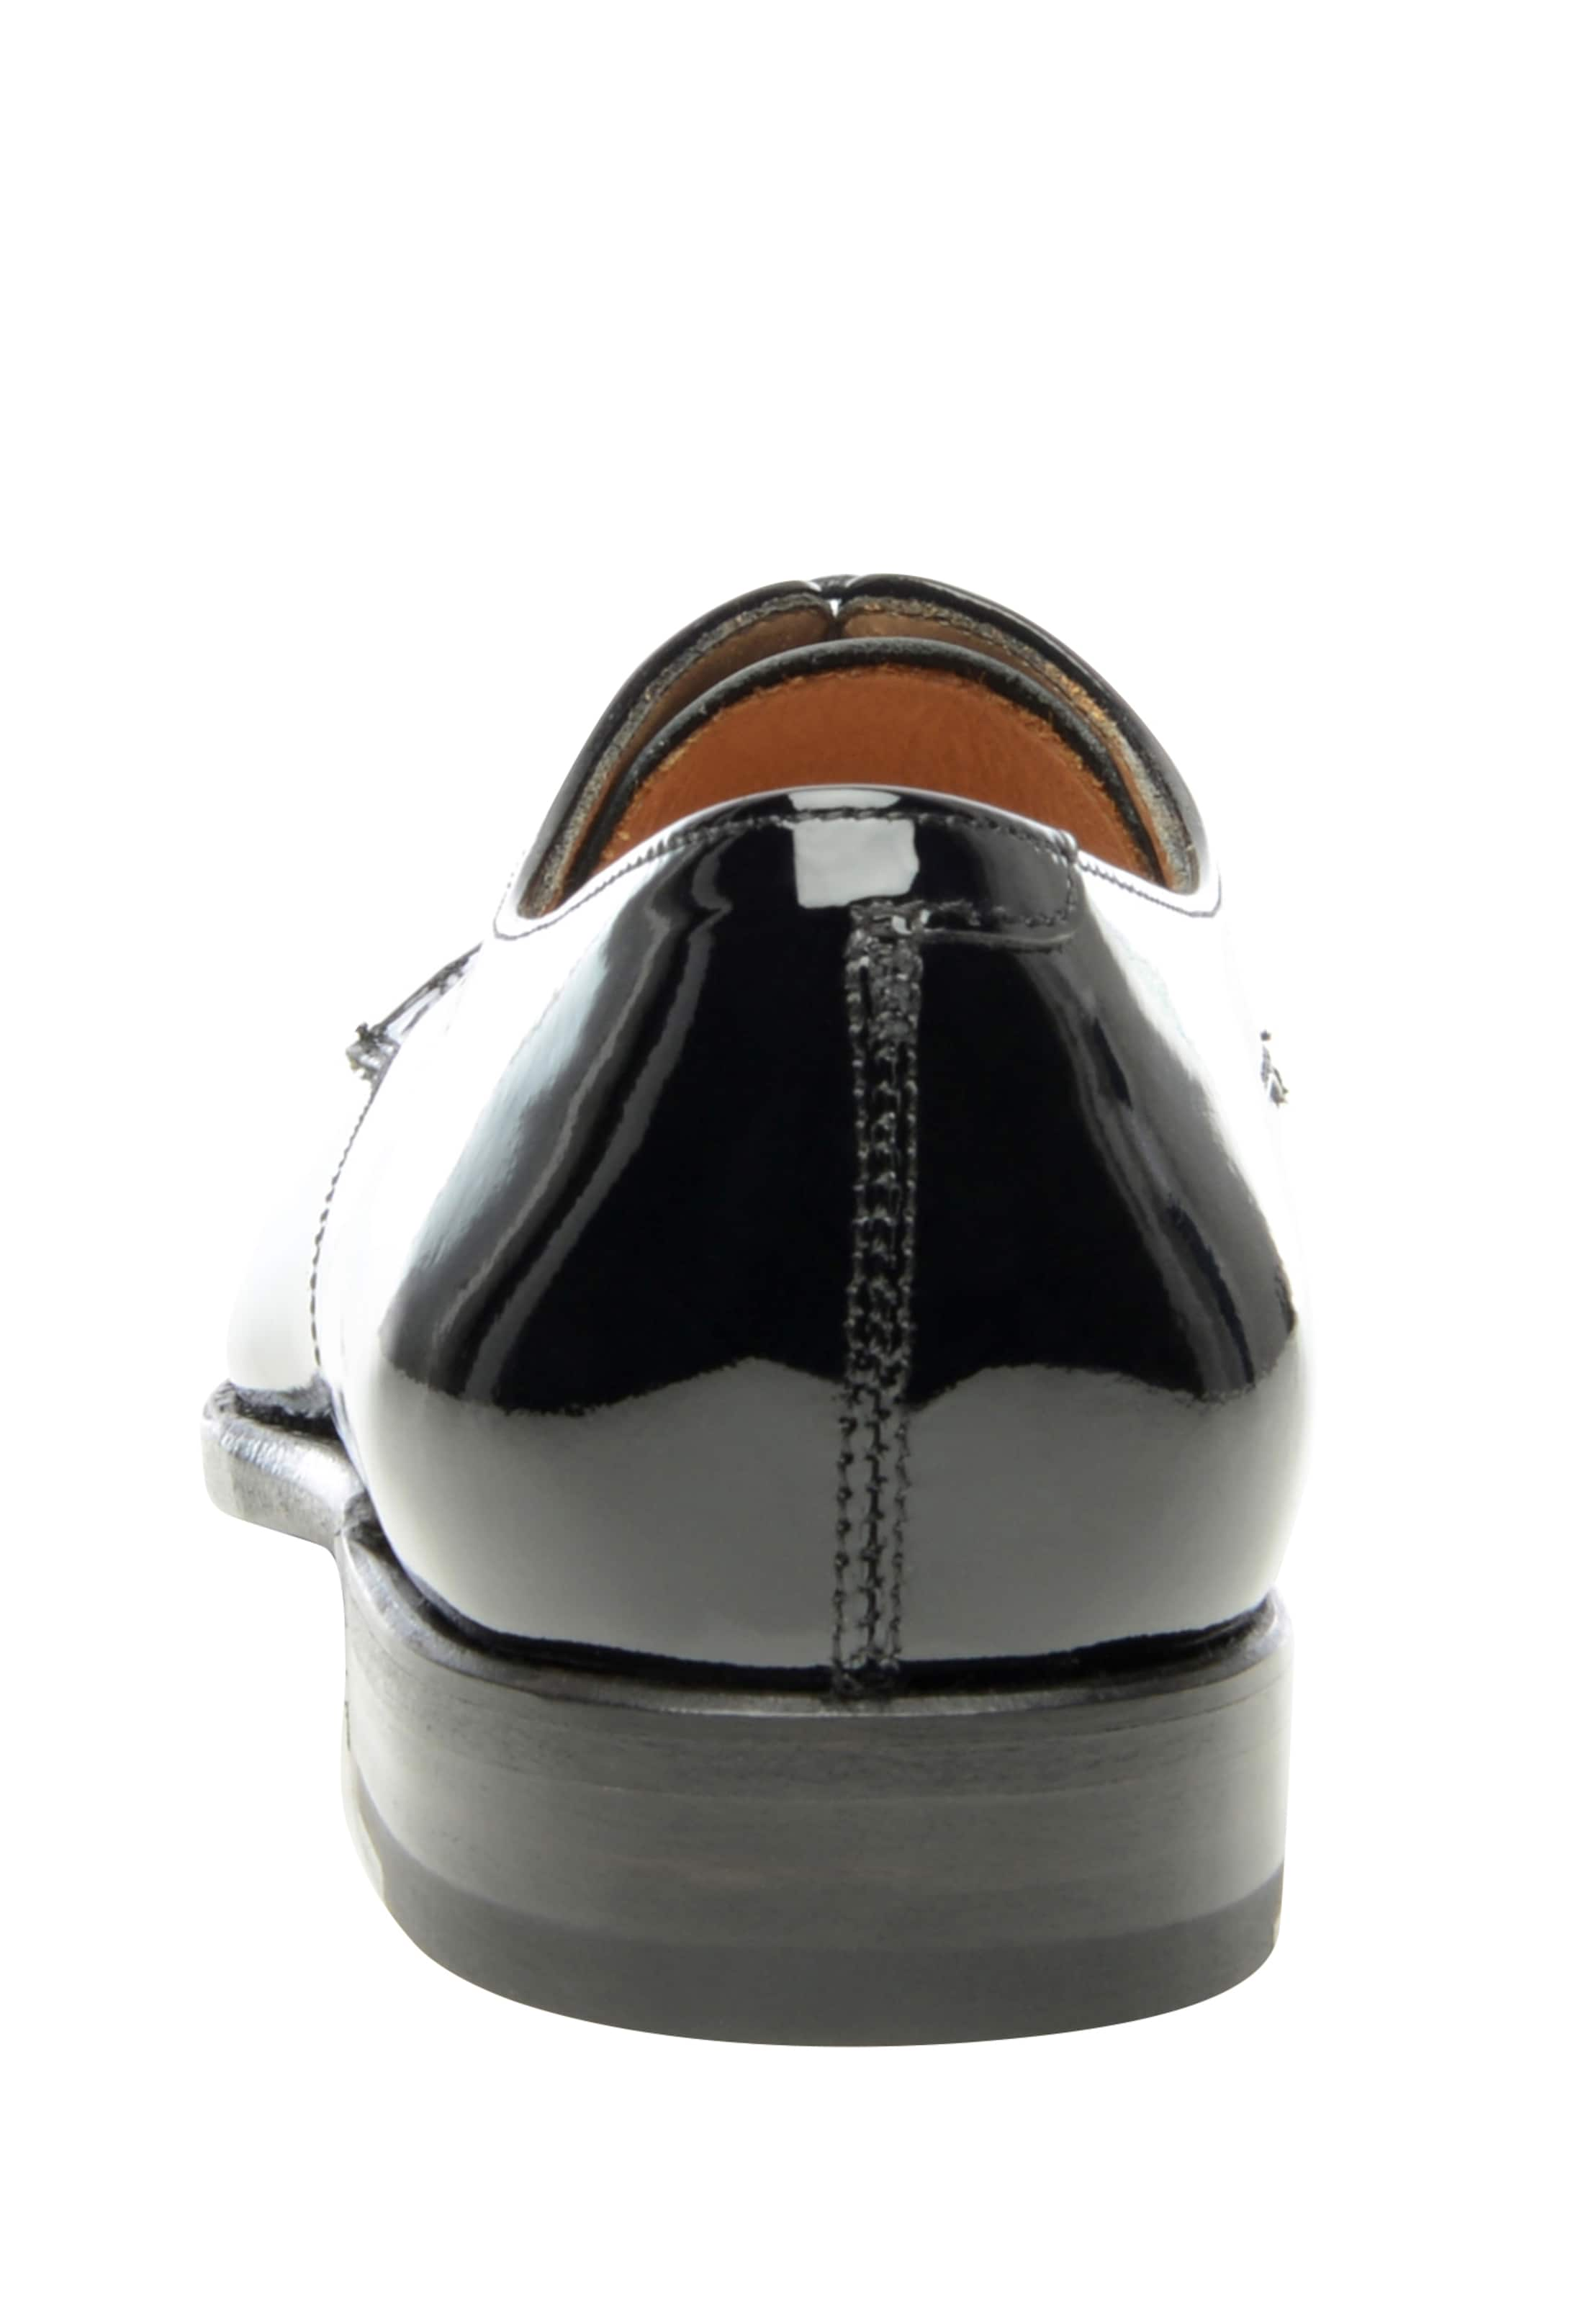 SHOEPASSION Schnürschuhe 'No. 102' Profi Zu Verkaufen Billig Verkaufen Mode qk9I2aqo5